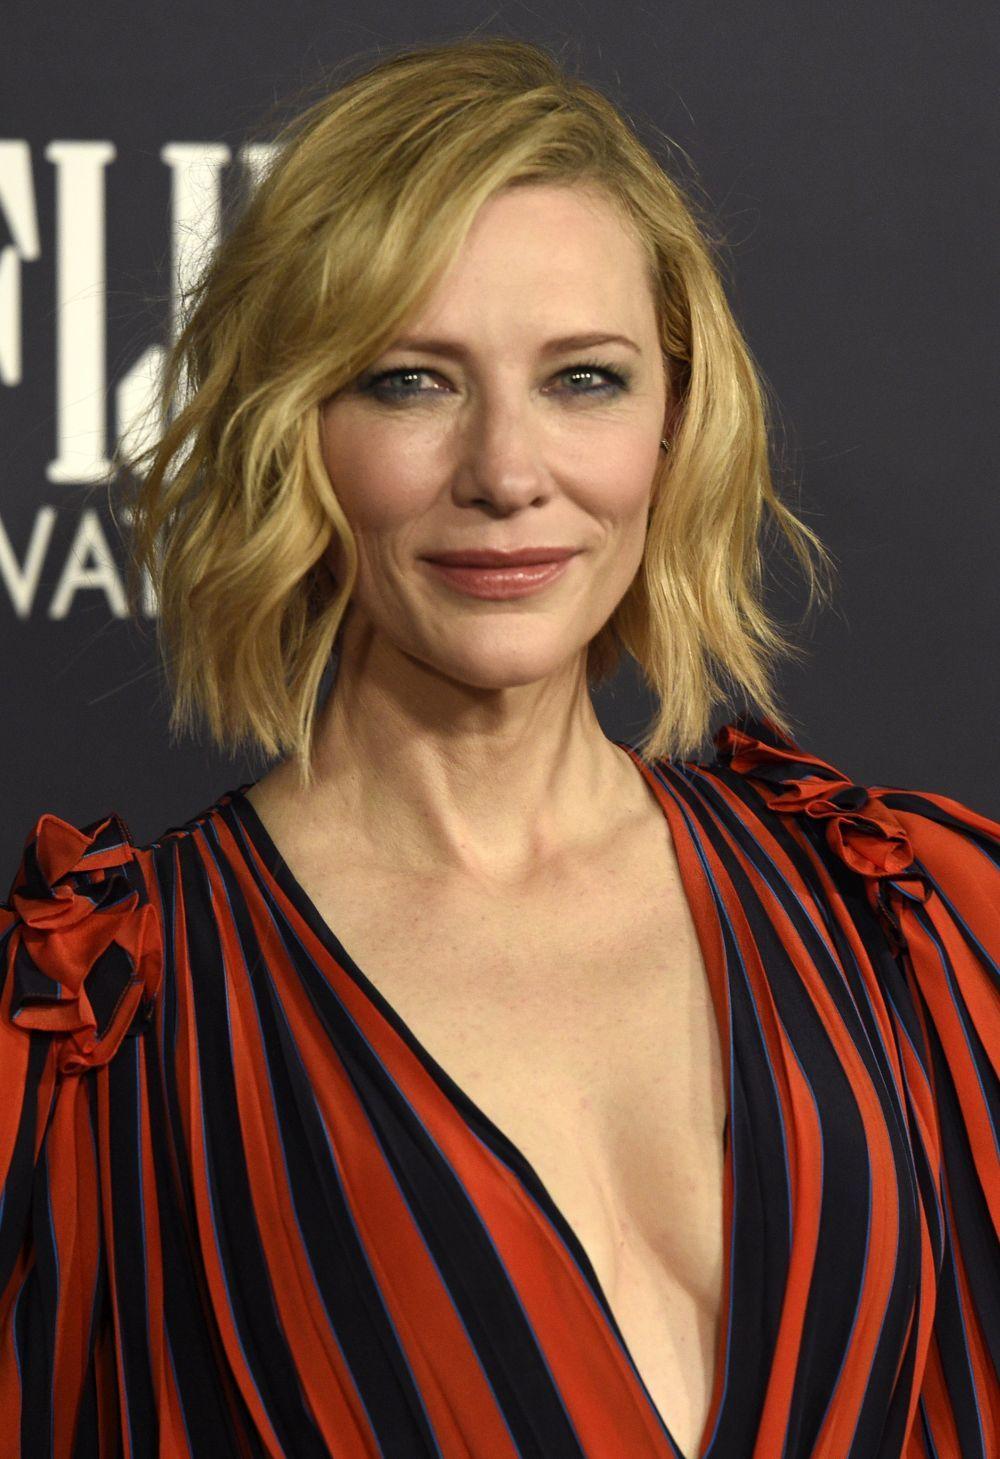 La actriz Cate Blanchett.